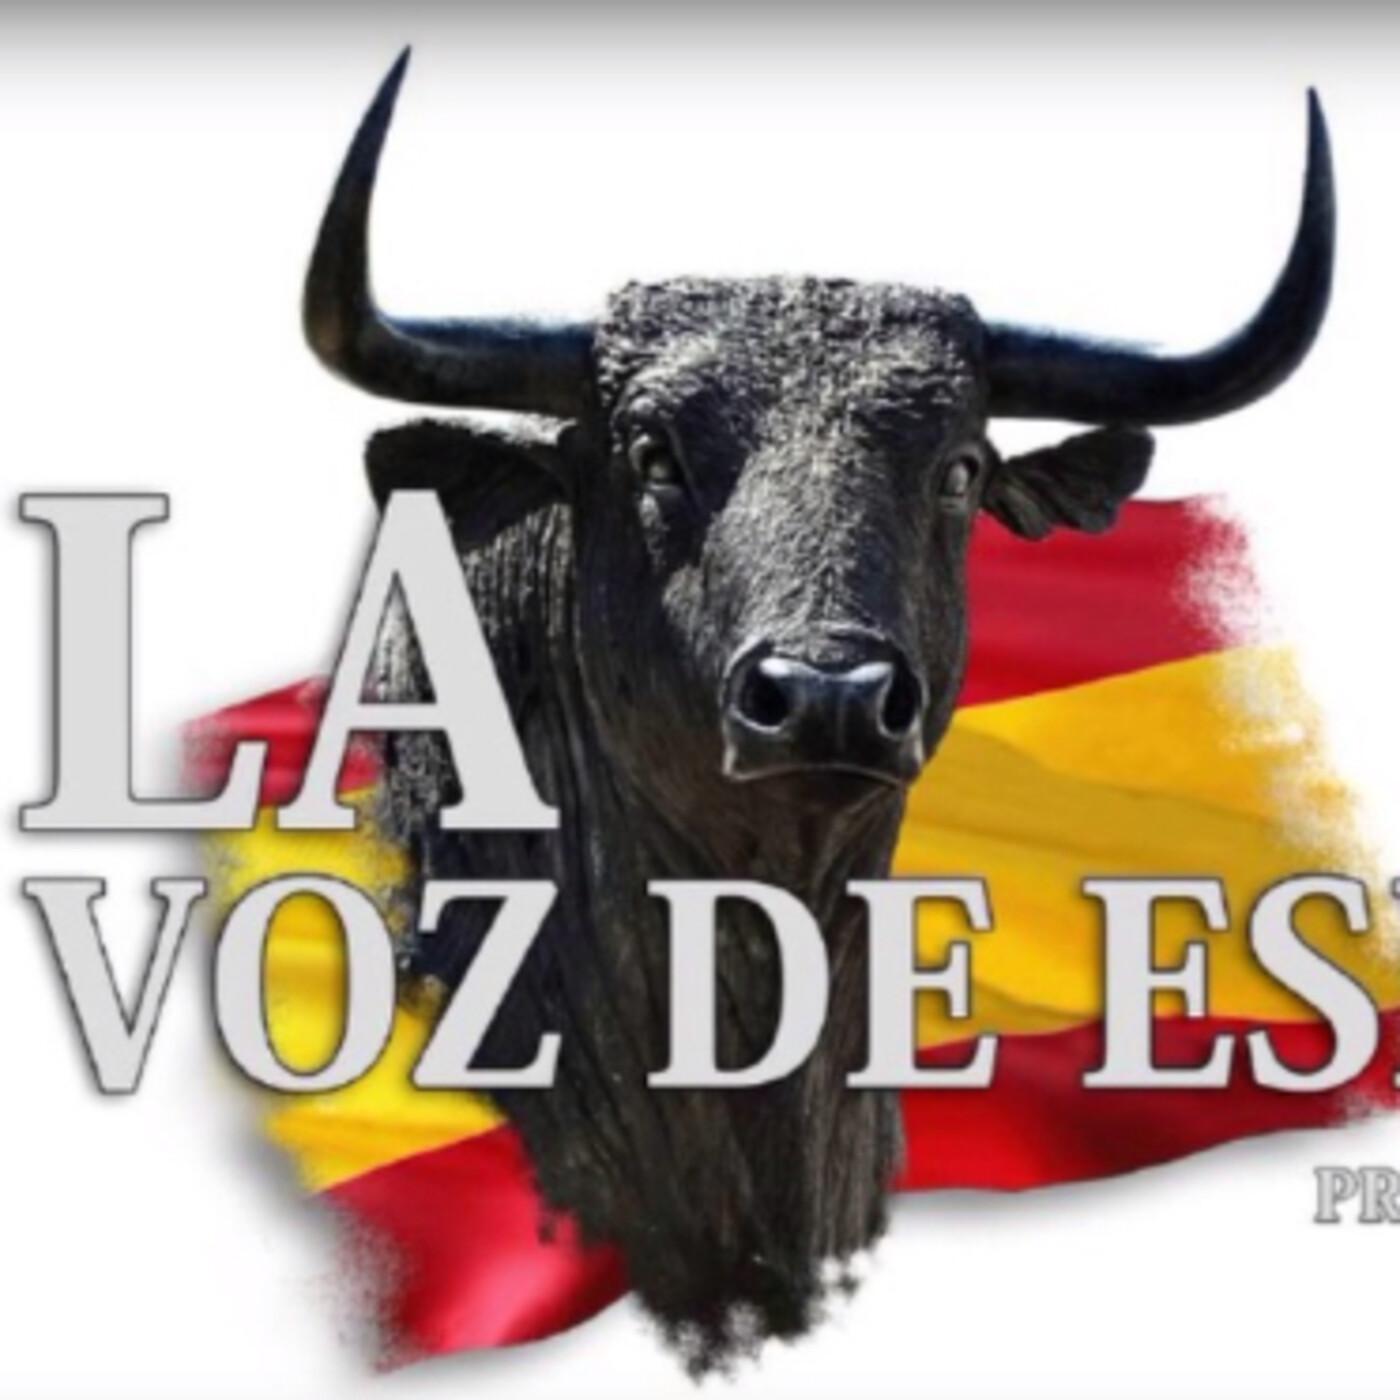 LA VOZ DE ESPAÑA Ed: 228 (13 de Mayo)